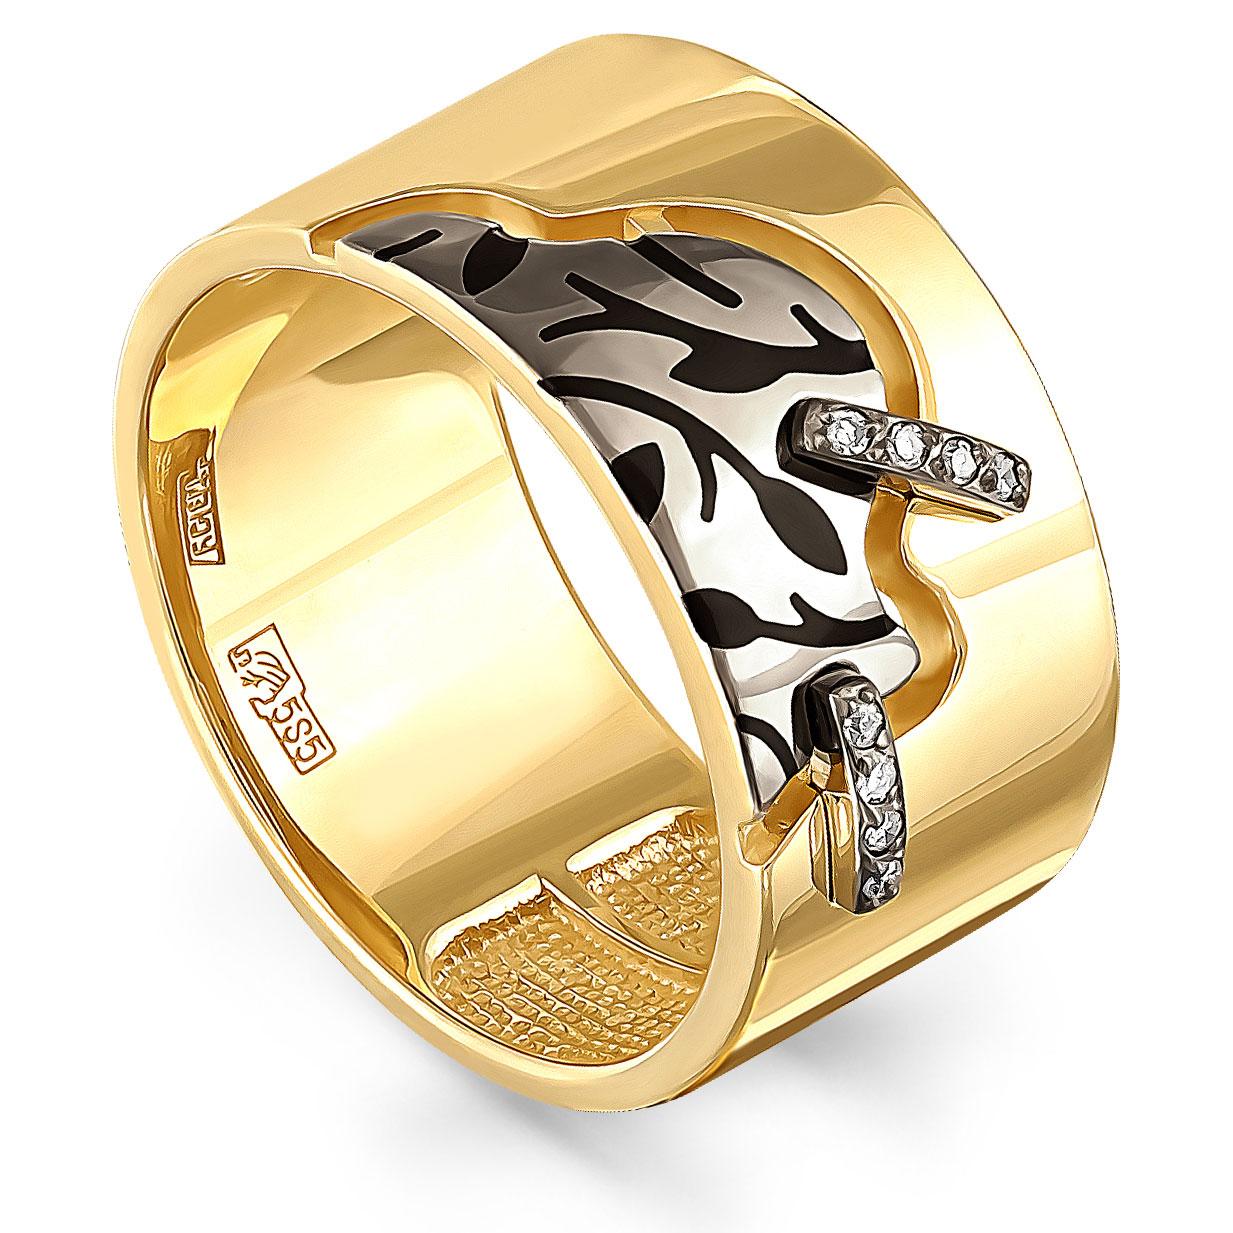 Кольцо из лимонного золота Бриллиант арт. 11-21009-1002 11-21009-1002